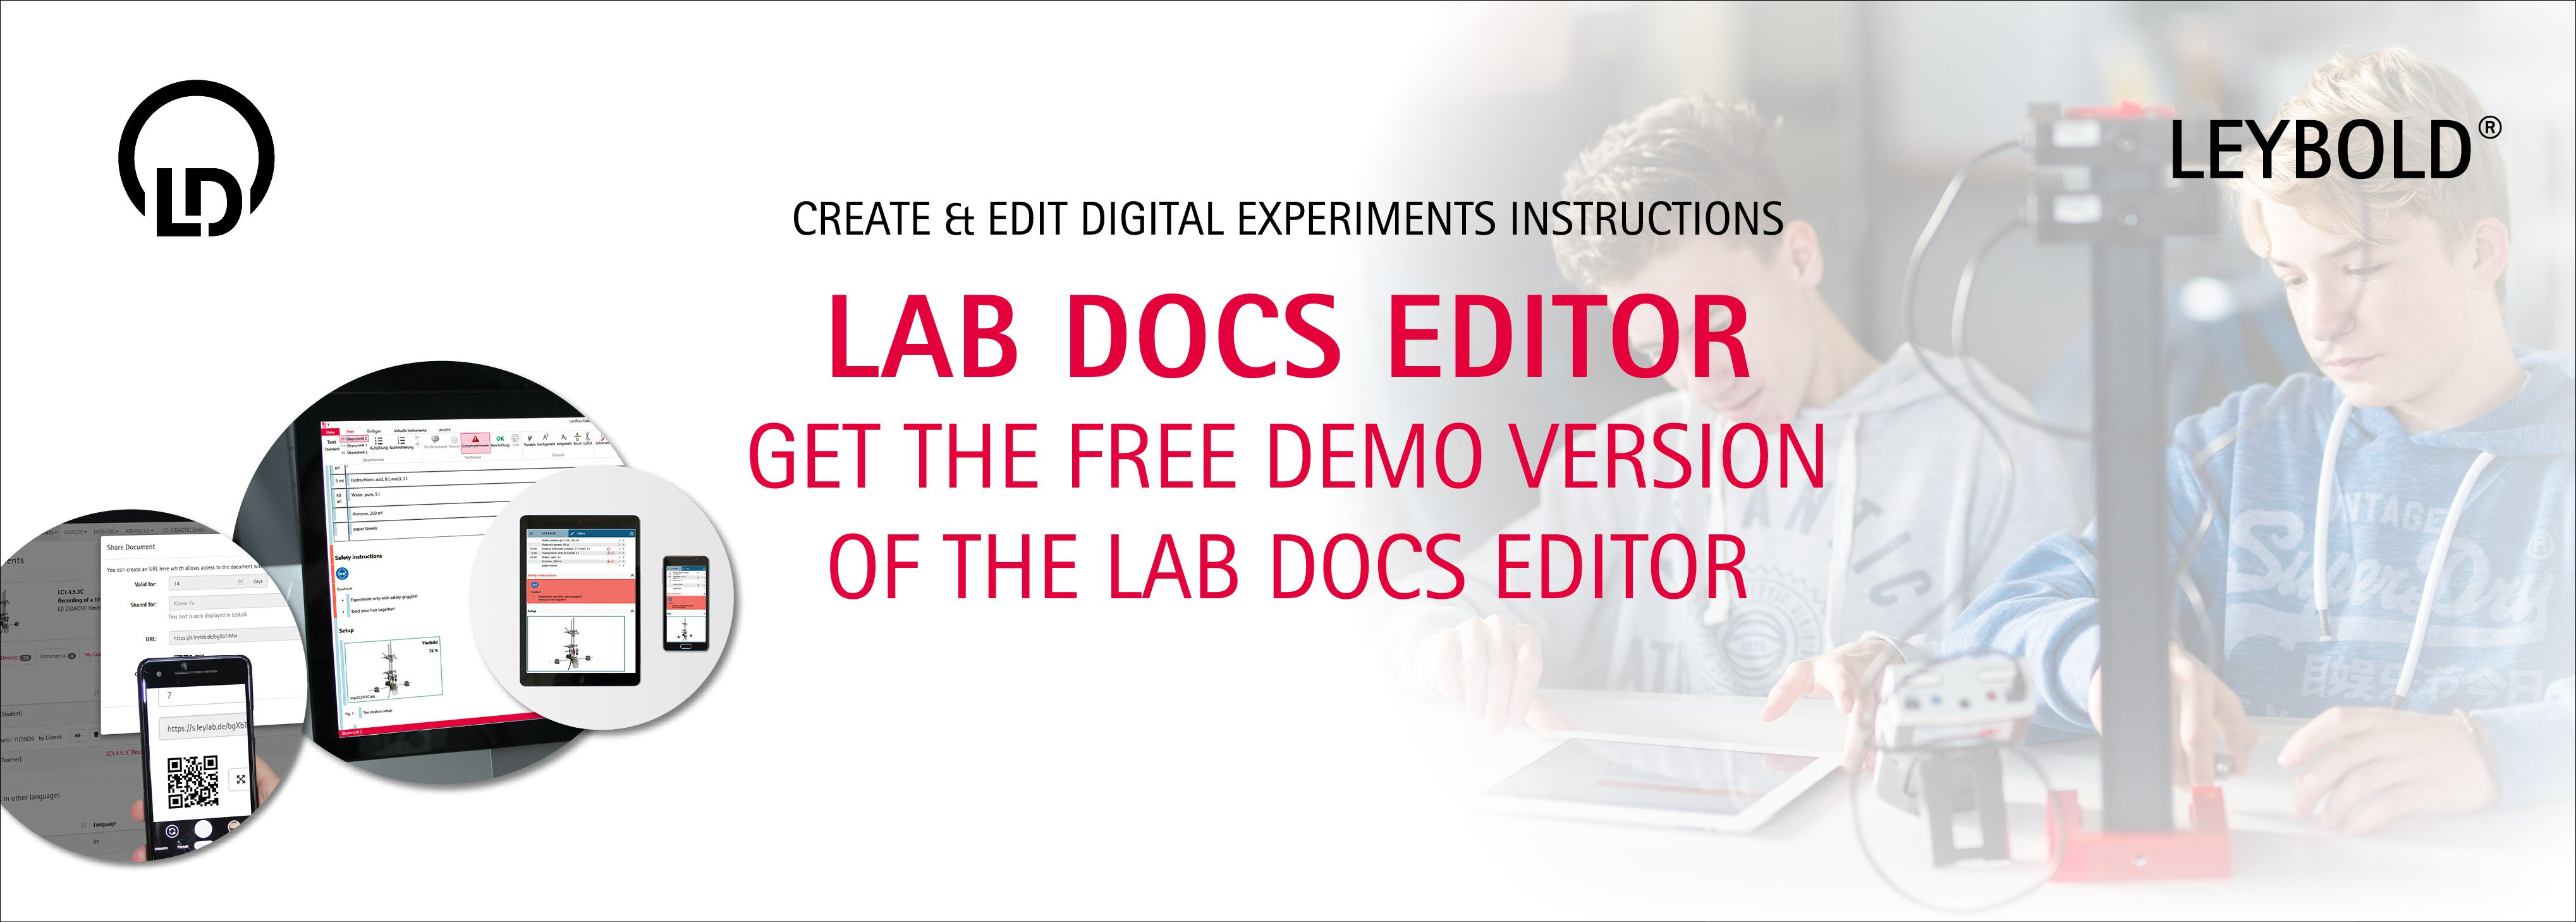 Lab Docs Editor